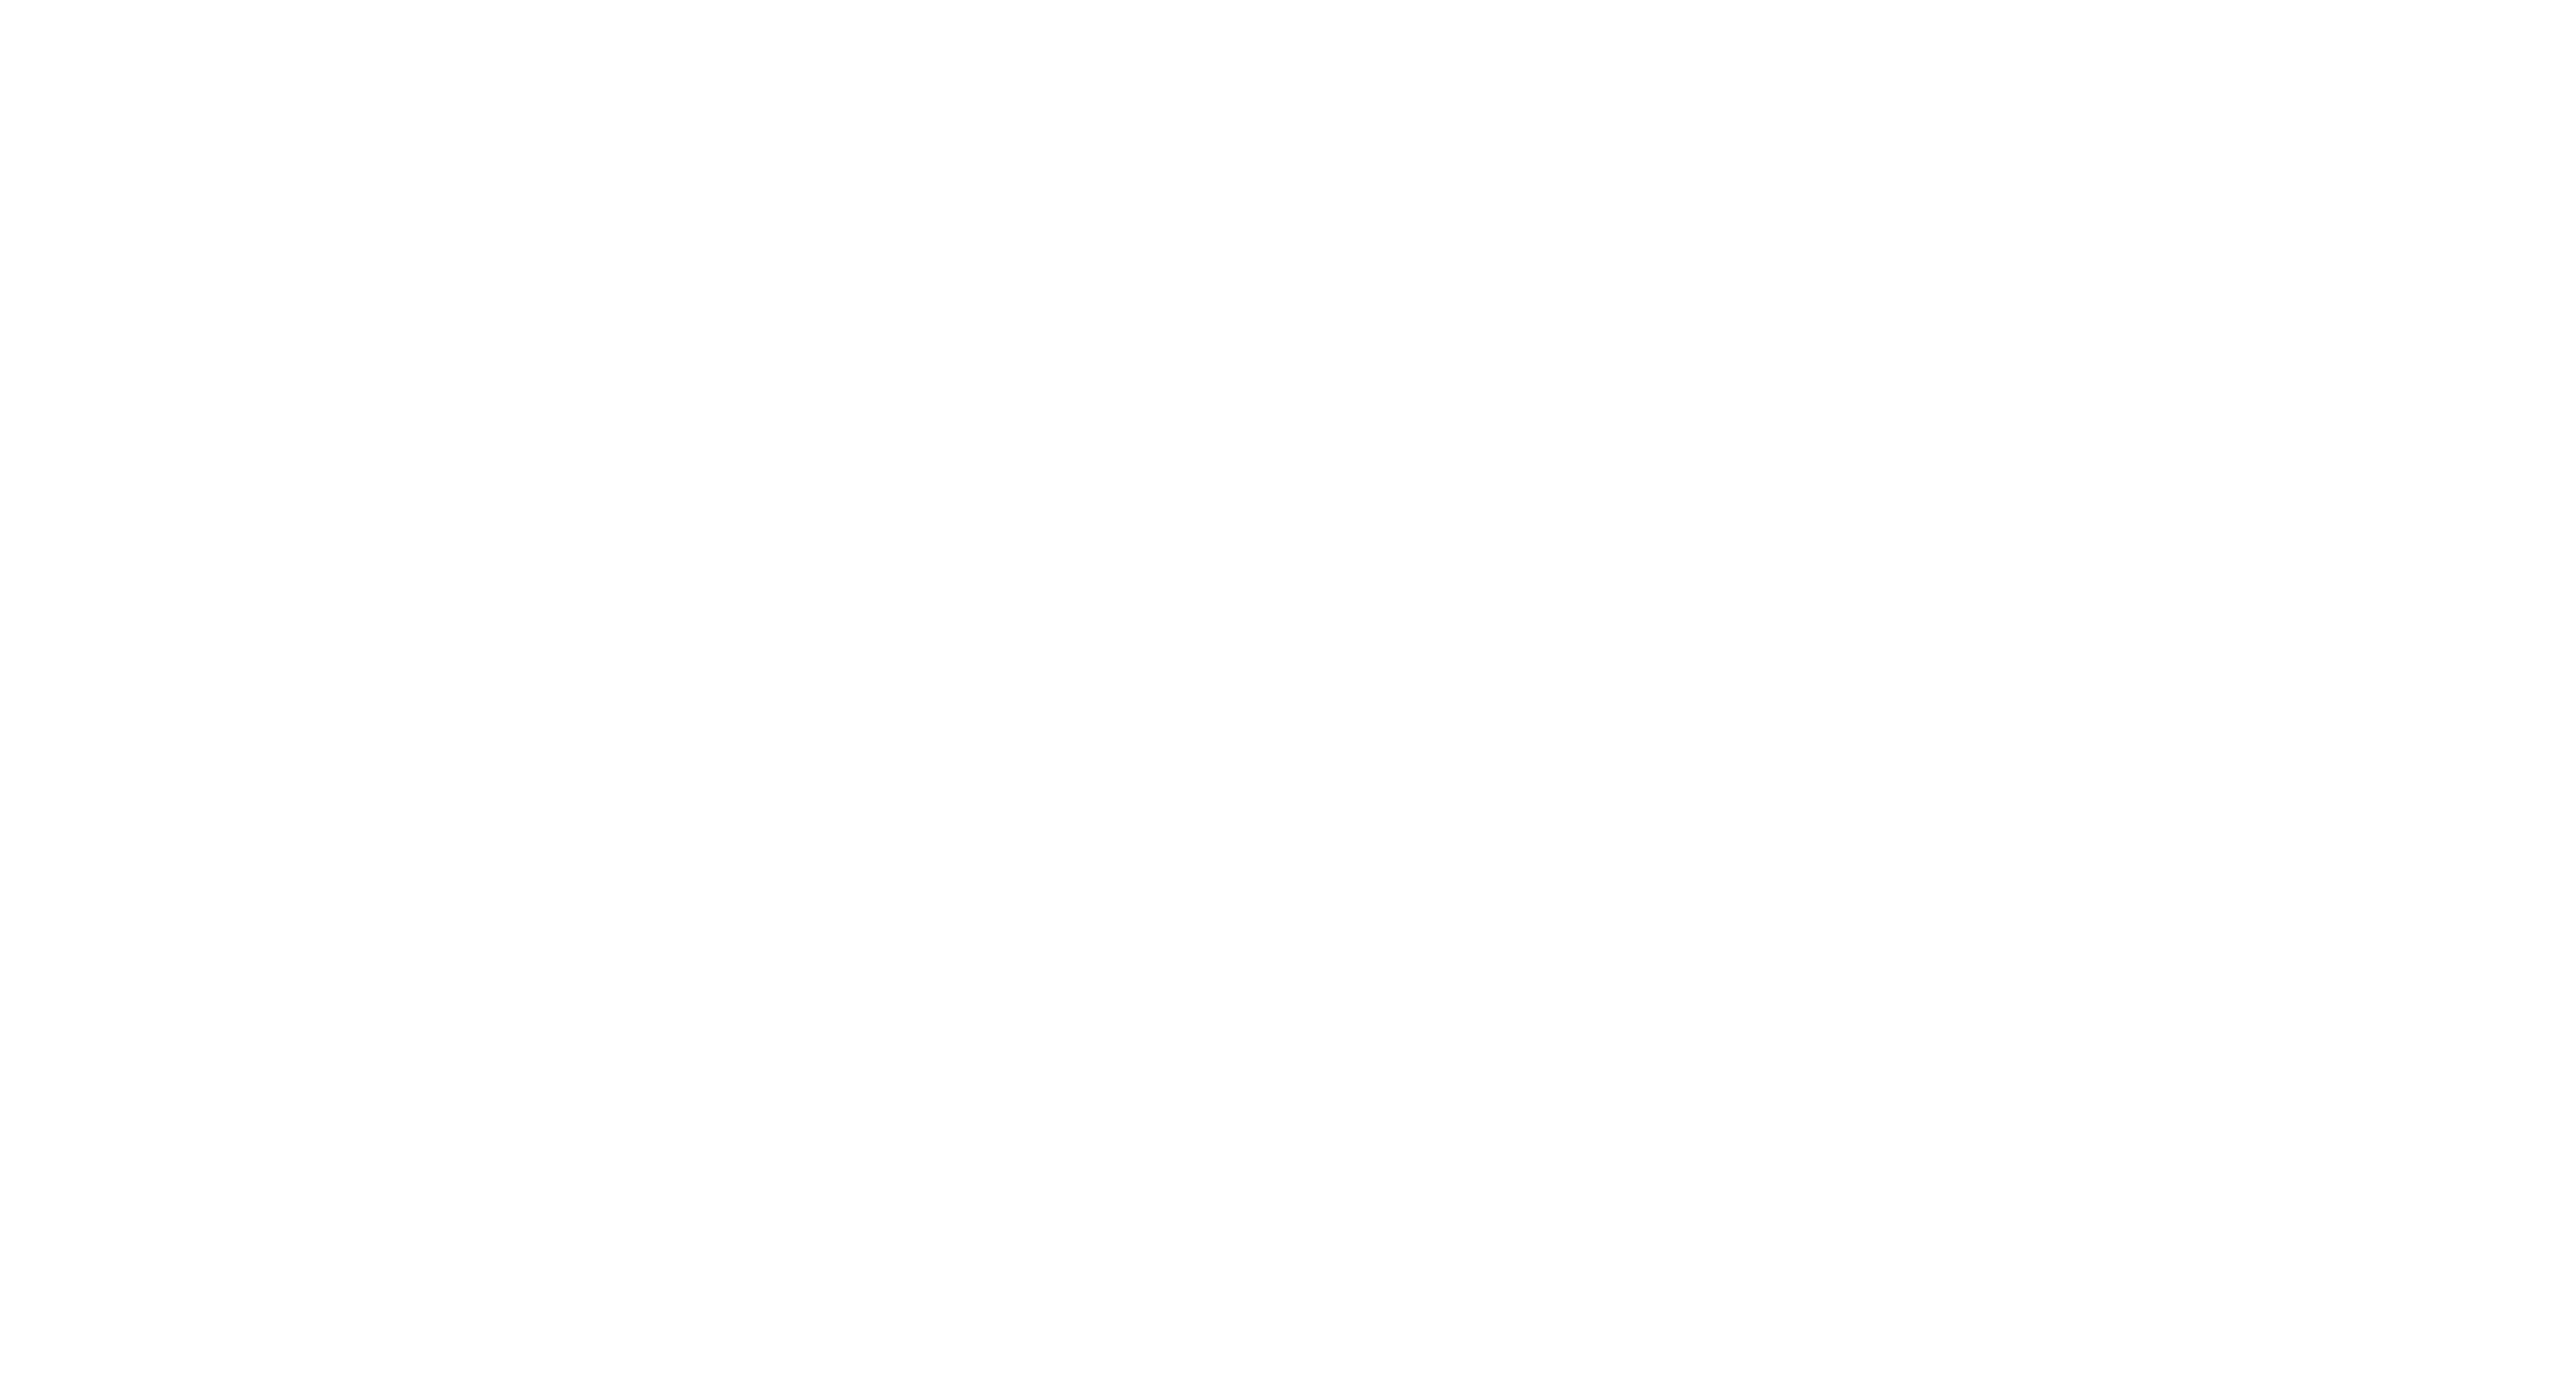 12views